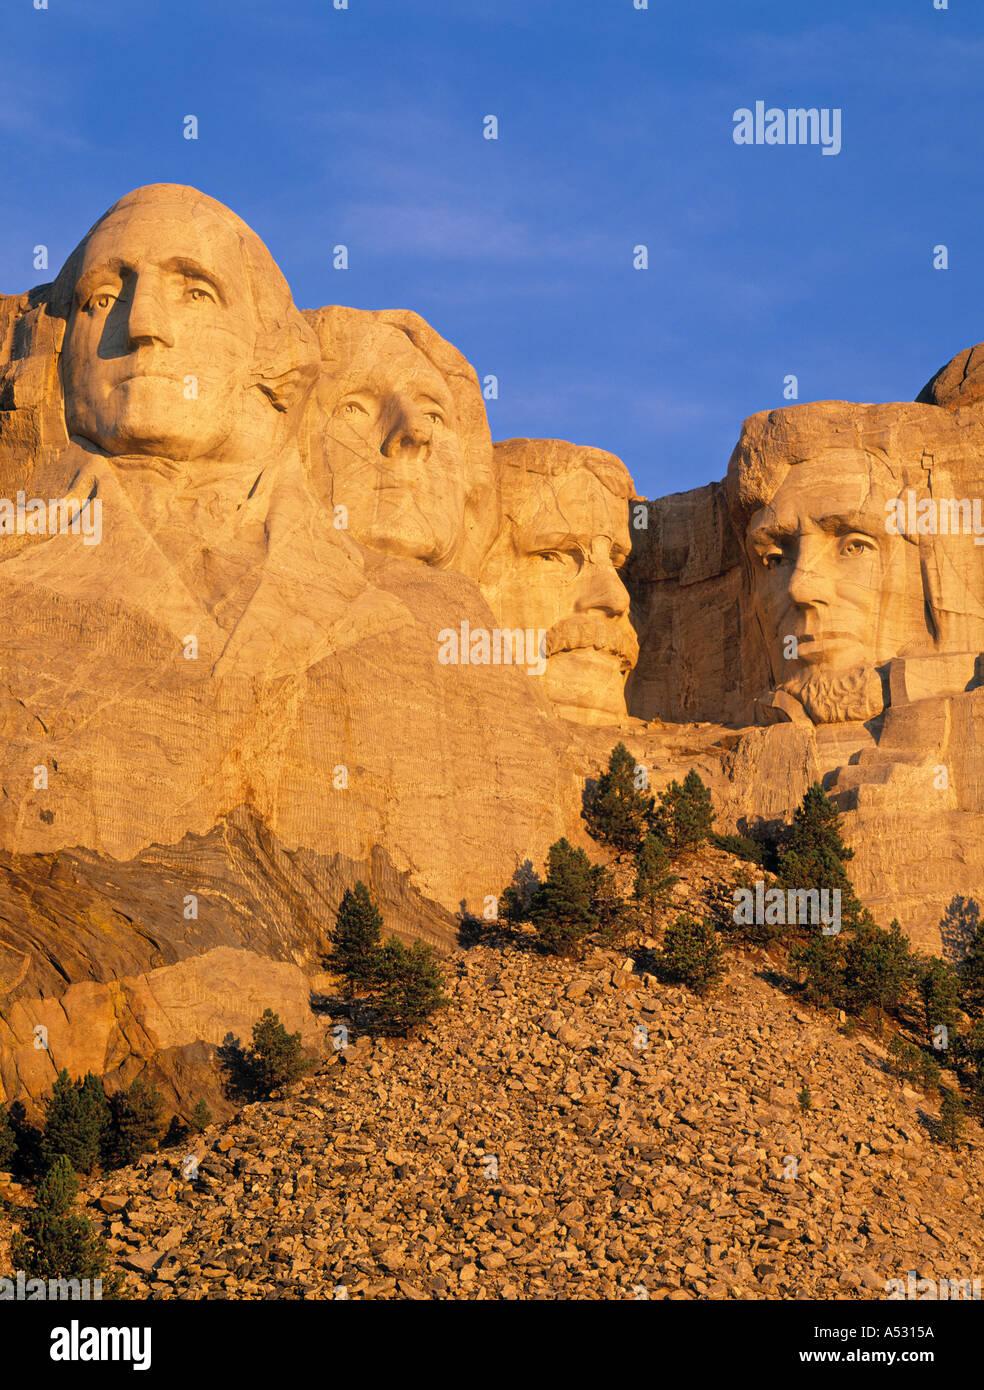 Mount Rushmore, South Dakota, USA - Stock Image